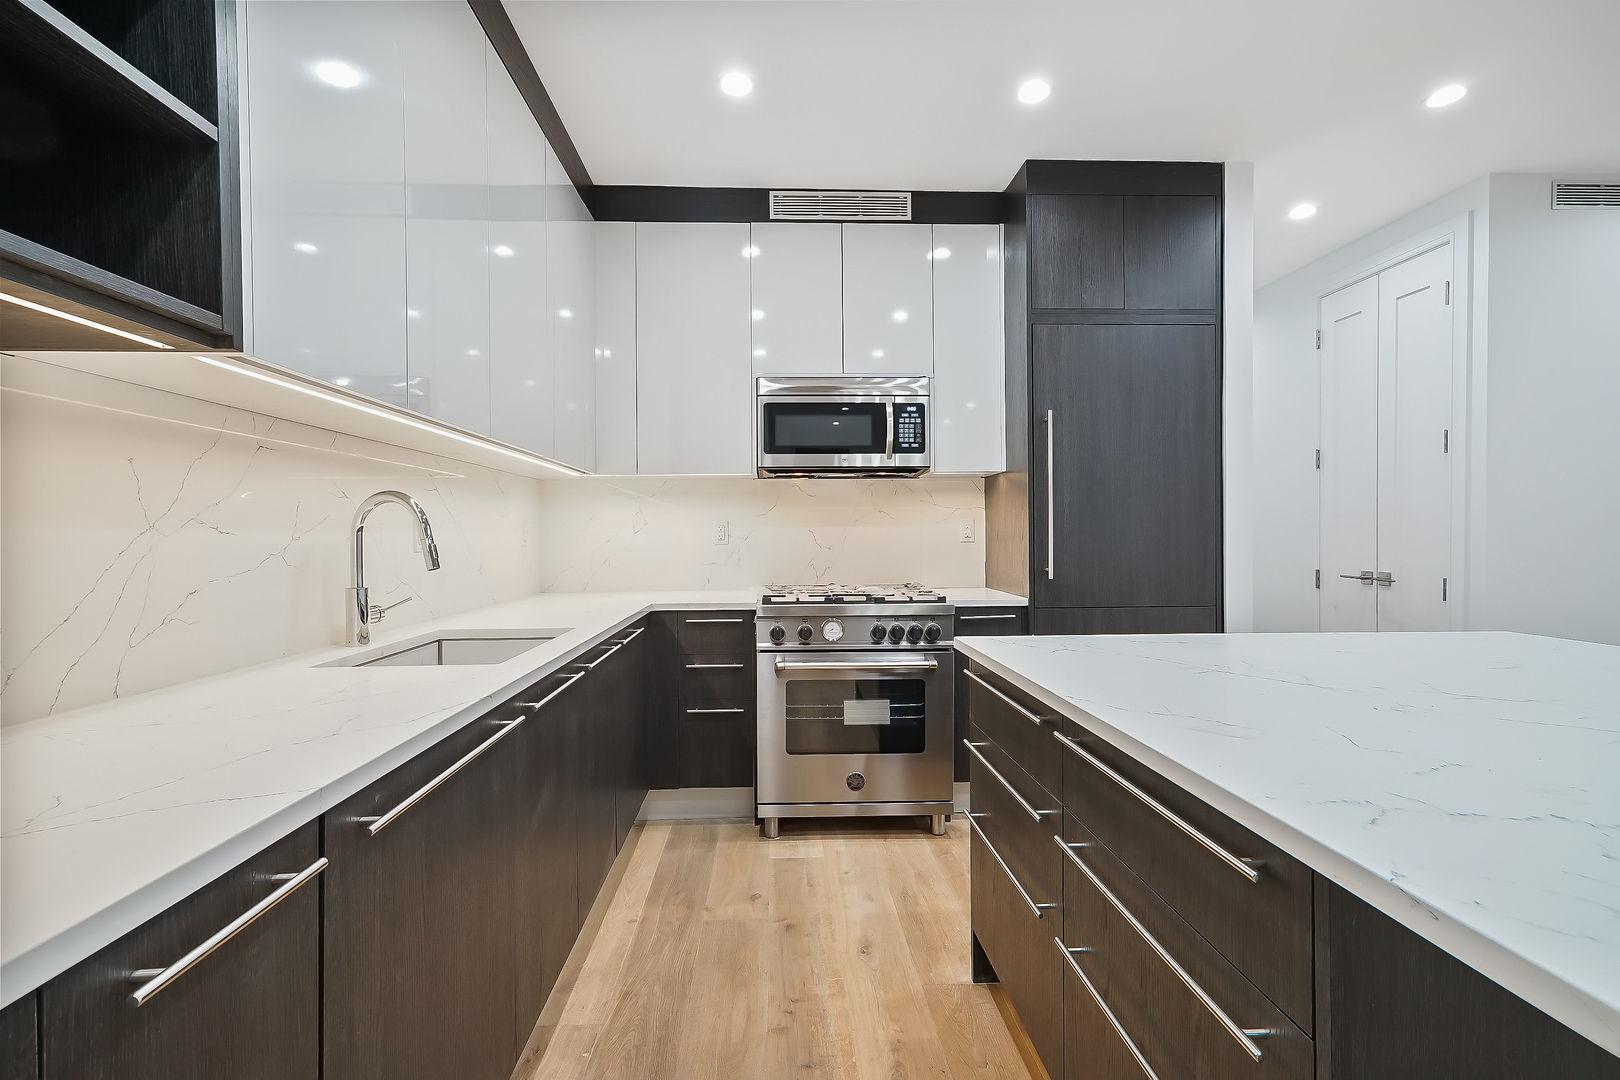 Apartment for sale at 40 Huntington Street, Apt 2c